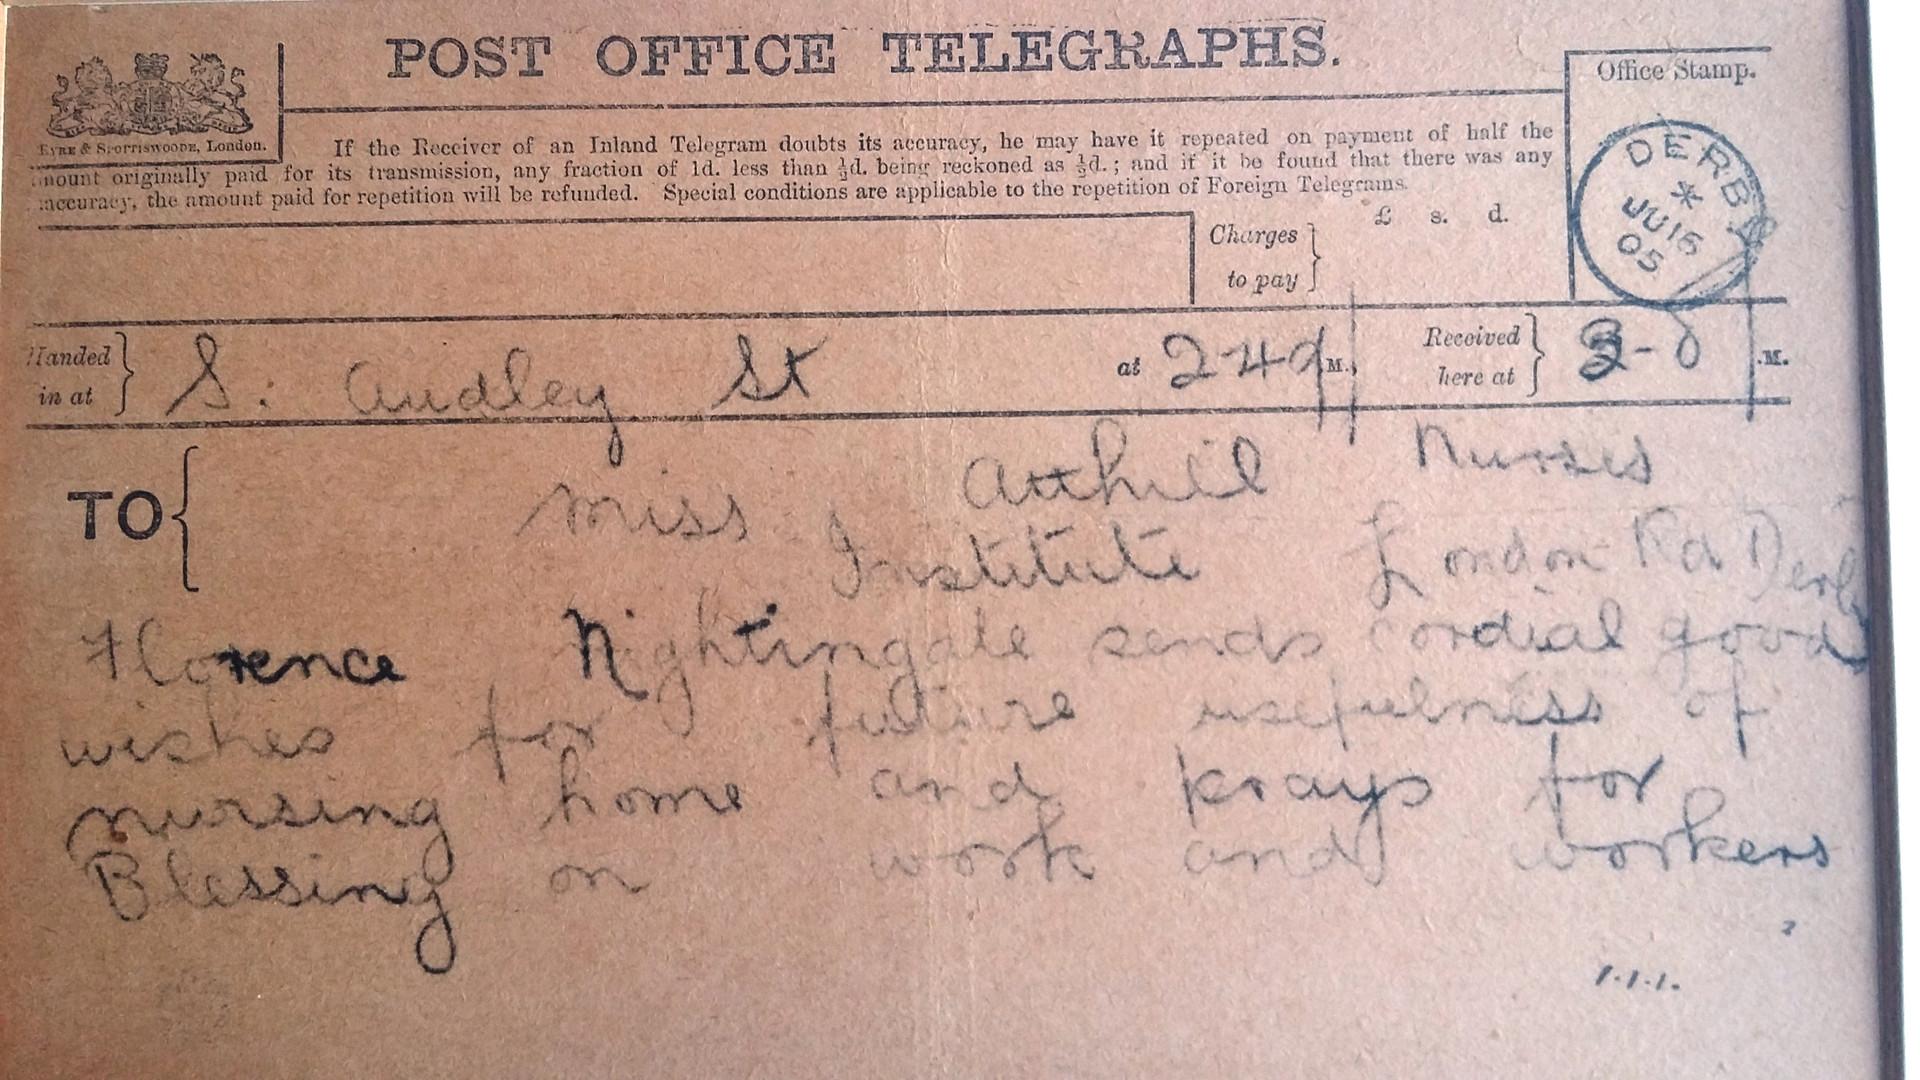 Telegram from Florence Nightingale.